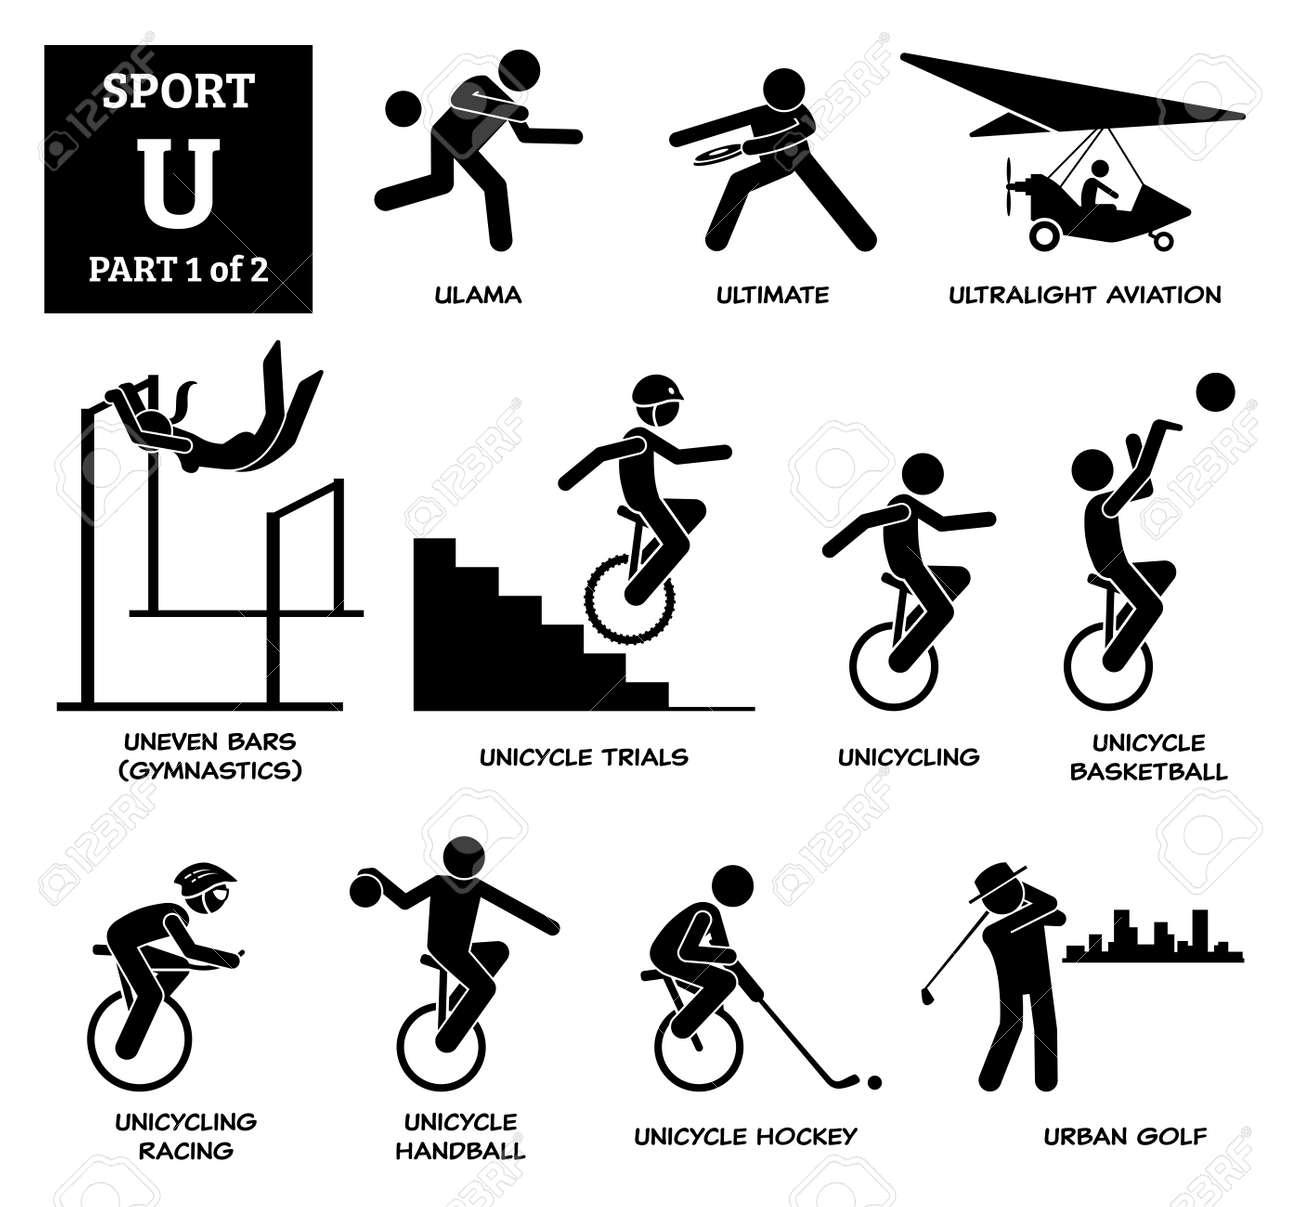 Sport games alphabet U vector icons pictogram. Ulama, ultimate, ultralight aviation, uneven bars gymnastic, unicycle trials, unicycling, unicycle basketball, racing, handball, hockey, and urban golf. - 172367797